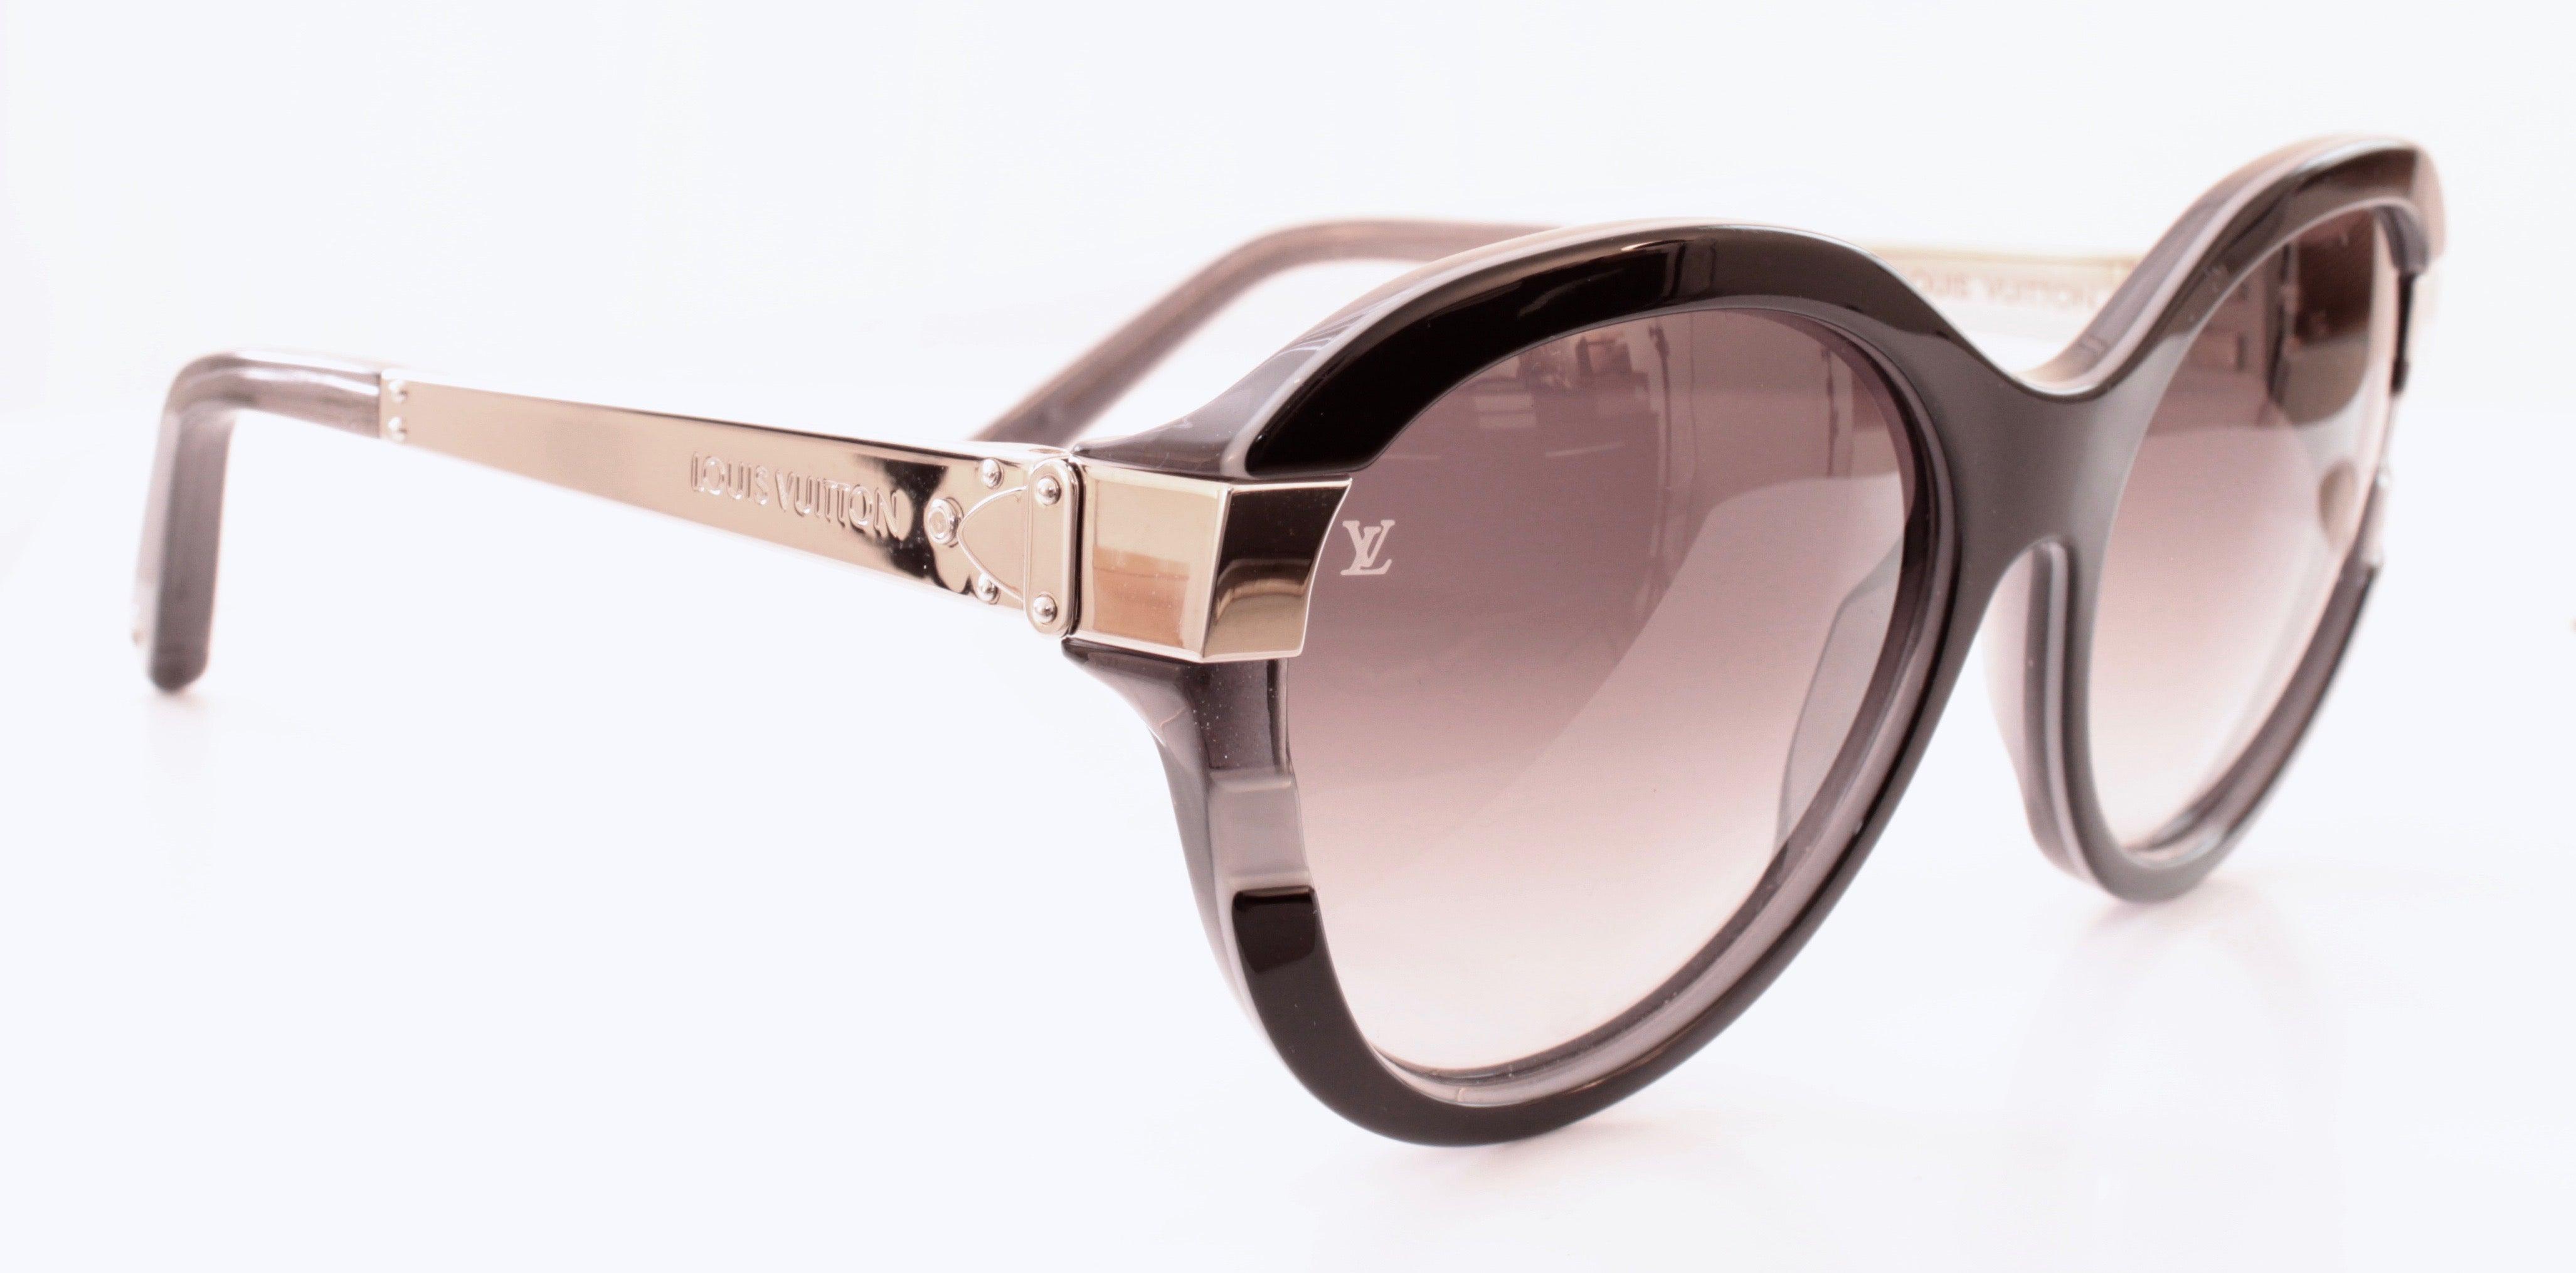 8eadd4888f615 Iconic Louis Vuitton Petit Soupçon Cat Eye Sunglasses Black + Case Z0489W  2014 at 1stdibs